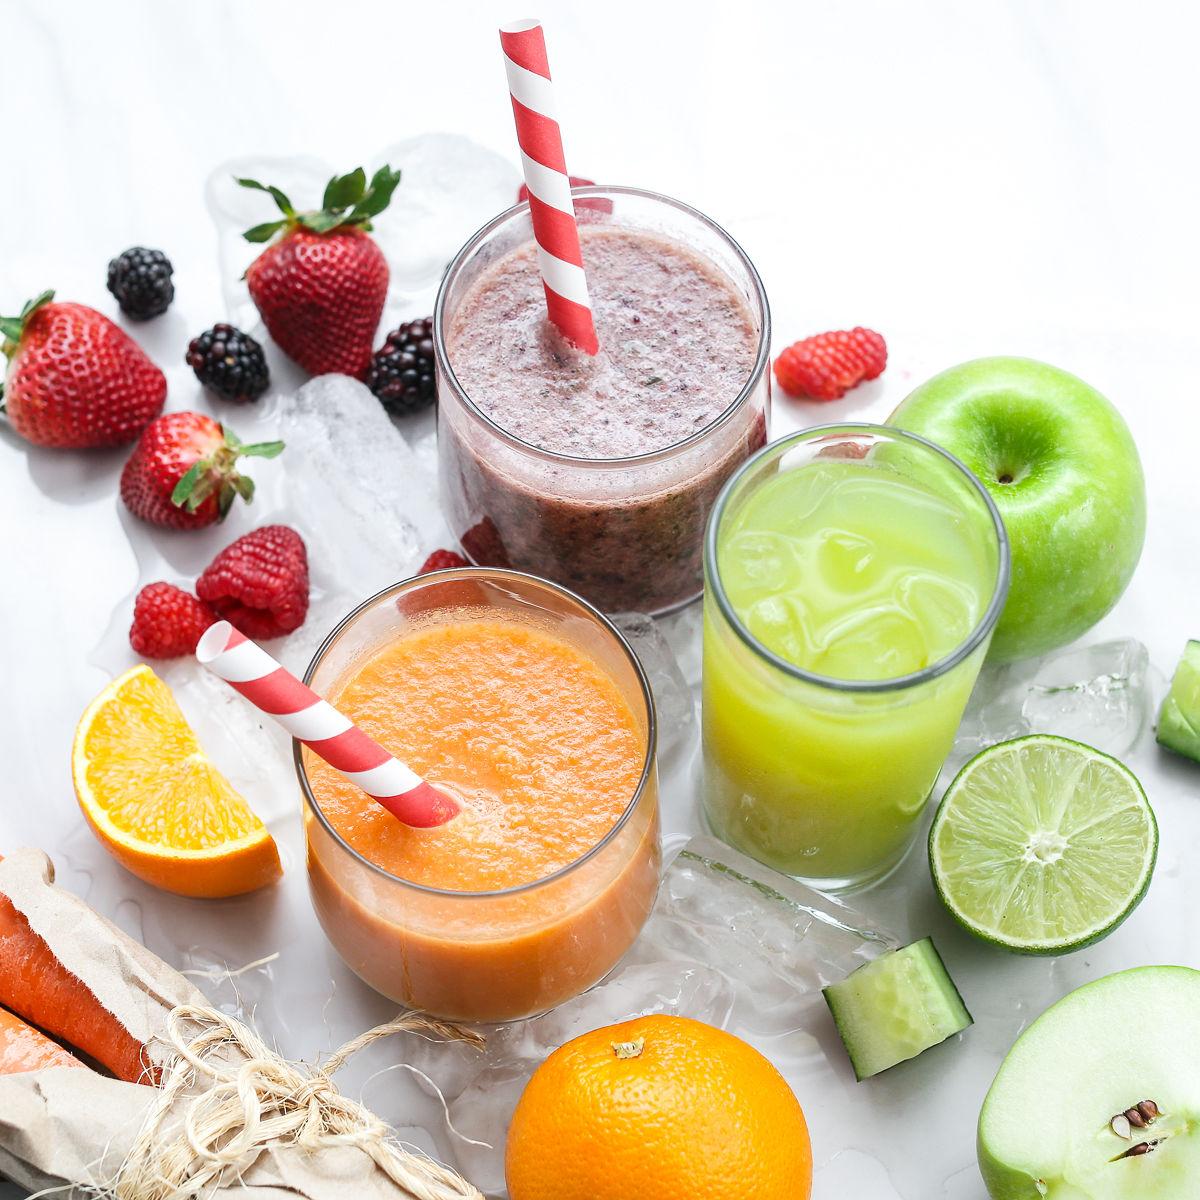 socialsquares_healthyeating14.JPG